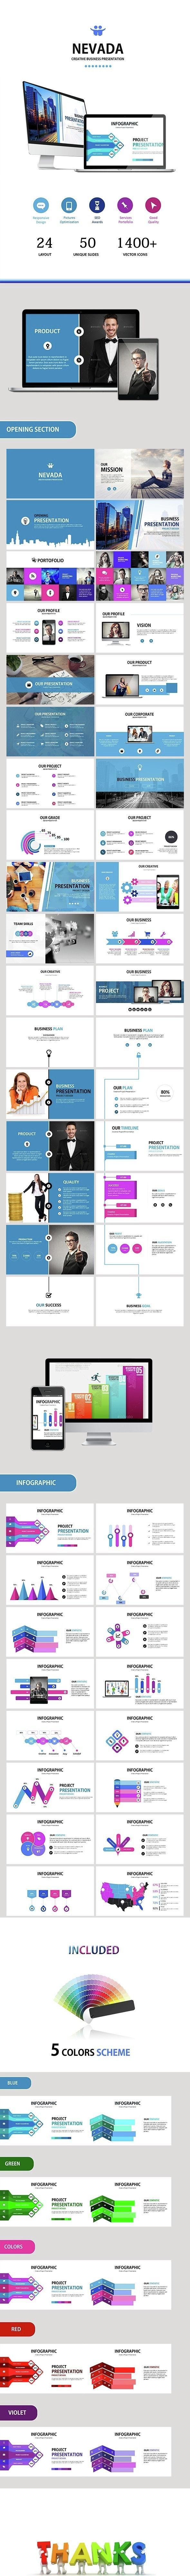 NEVADA - Google Slides Business Presentation - Google Slides Presentation Templates